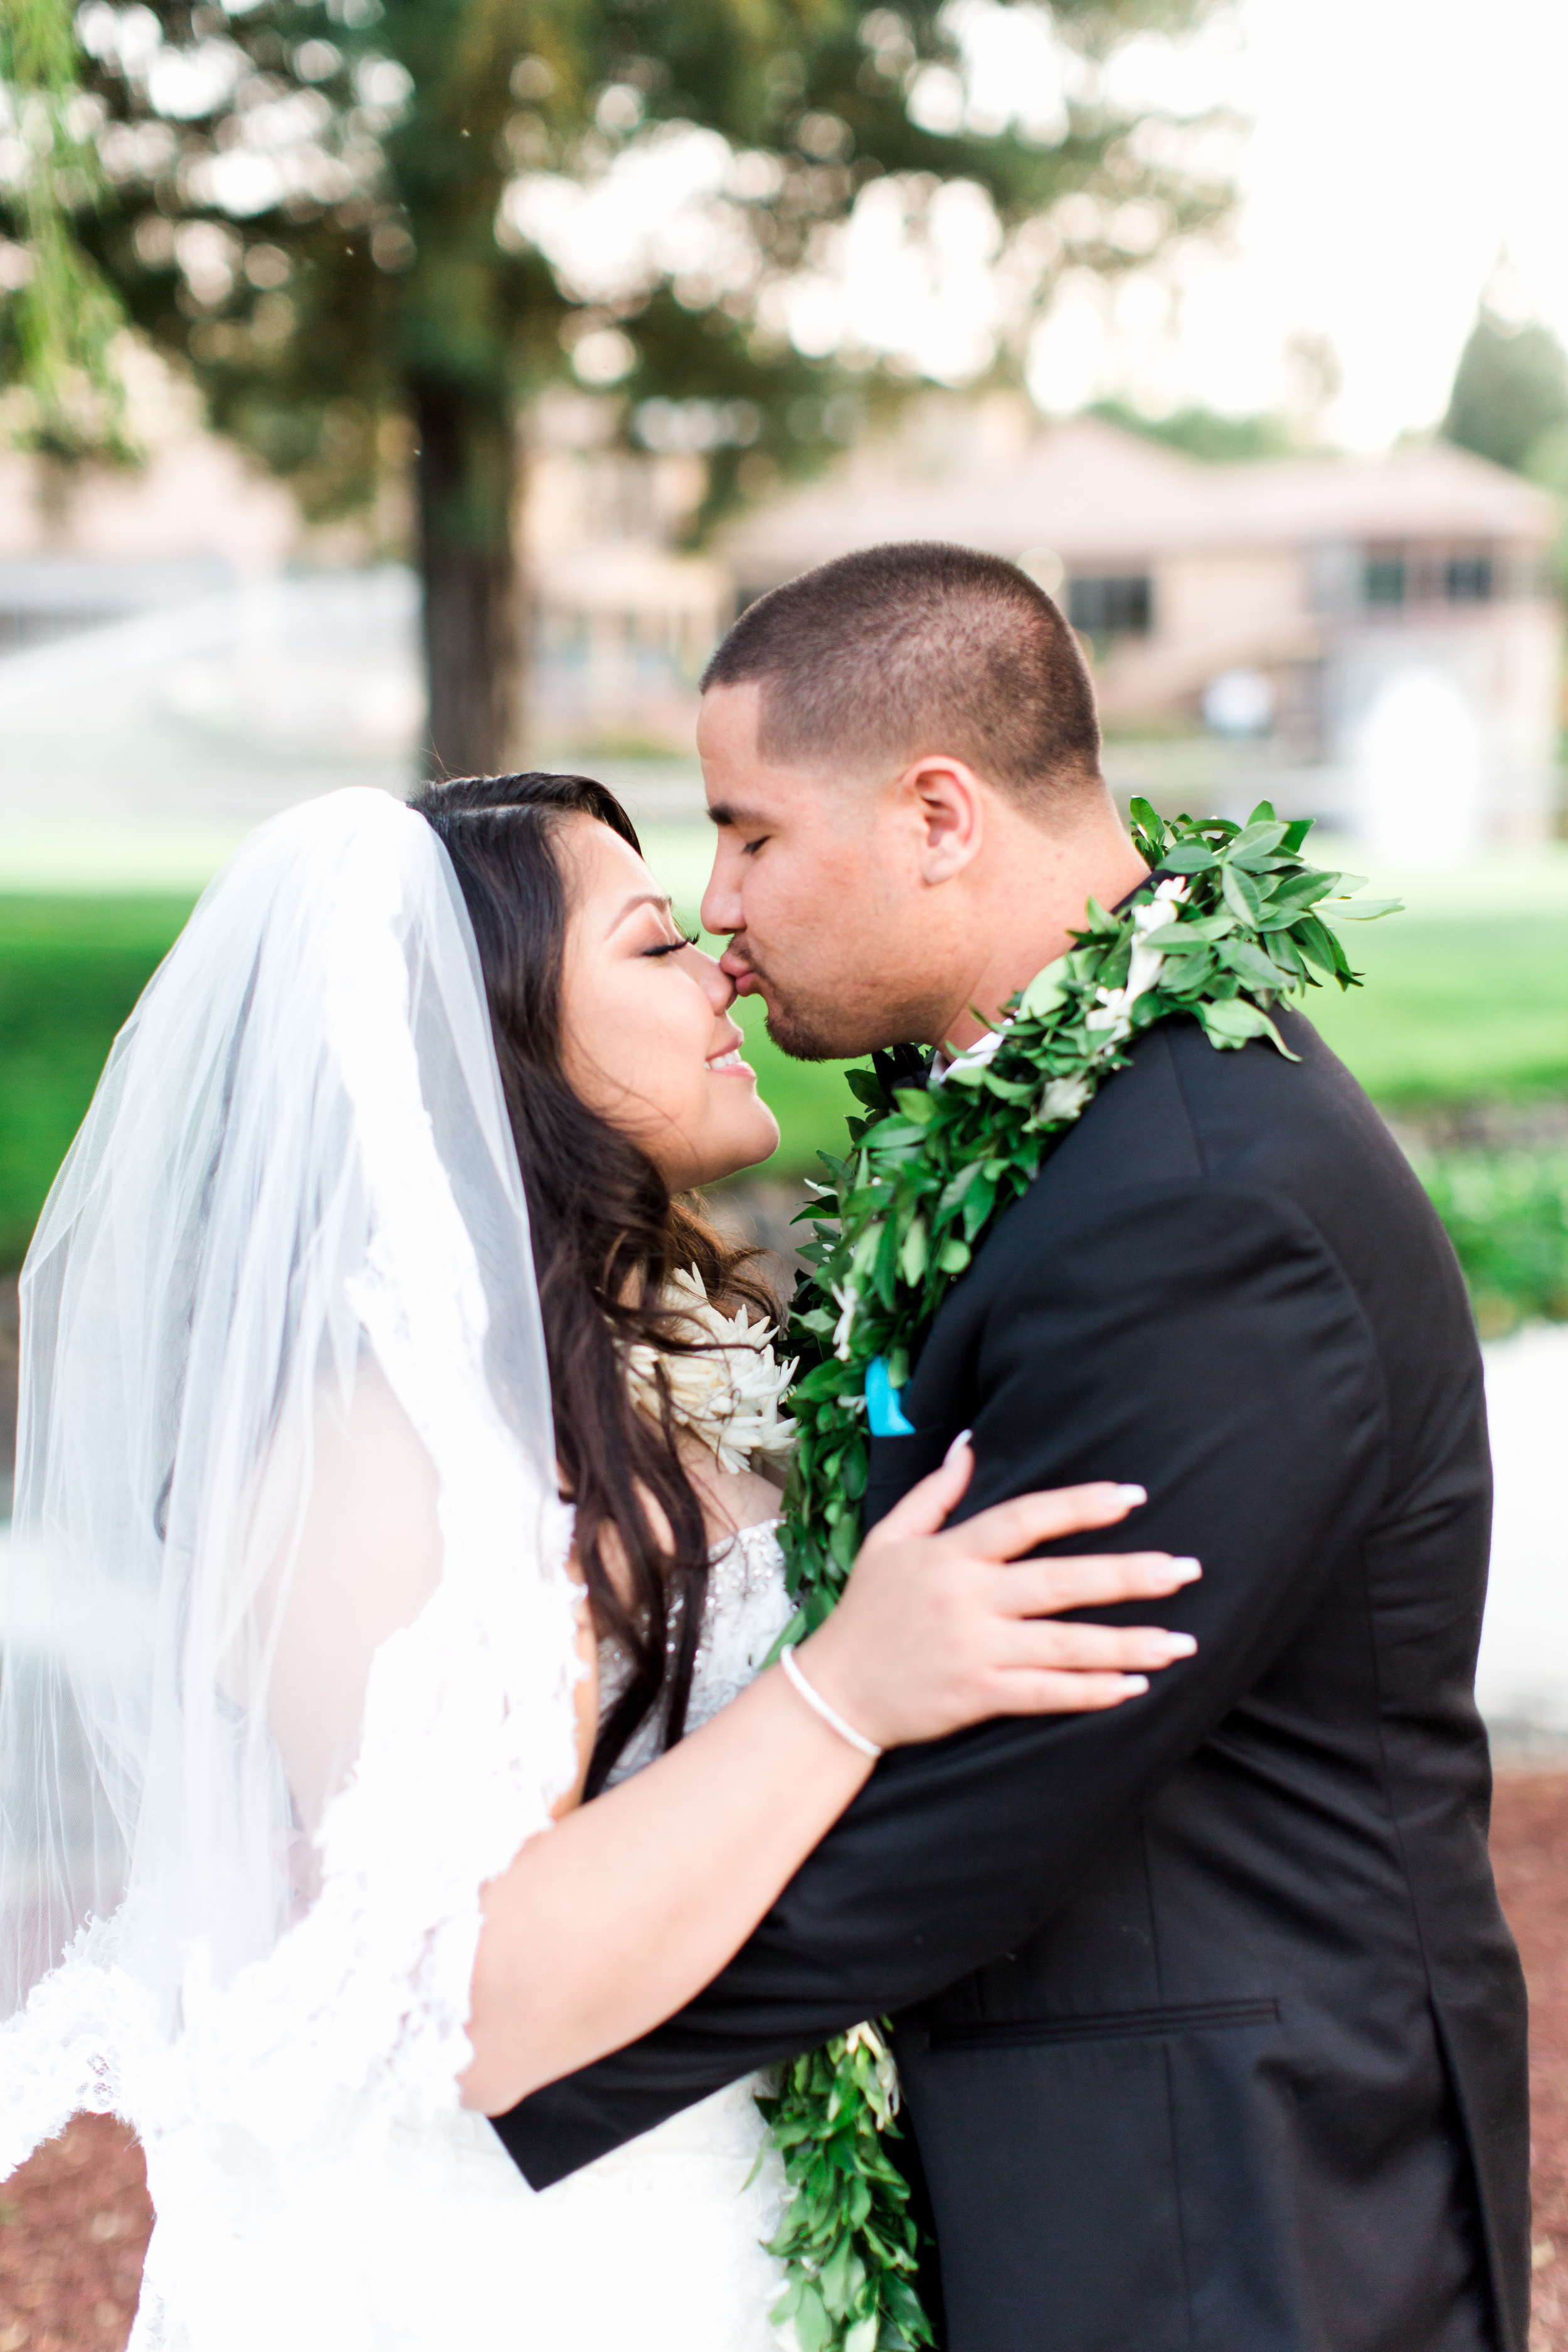 hawaiian-inspired-wedding-at-blackhawk-country-club-3341.jpg